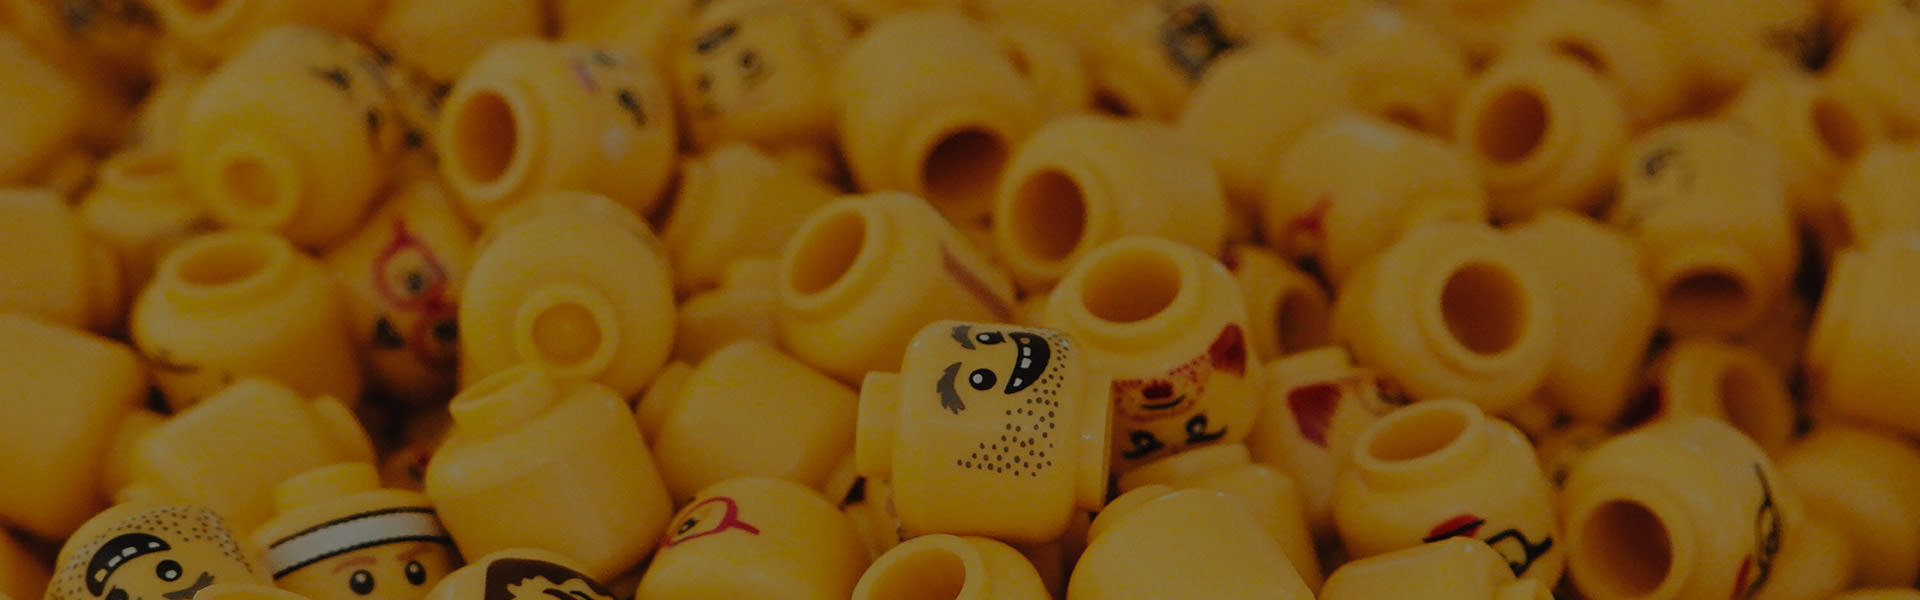 lego-heads.jpg